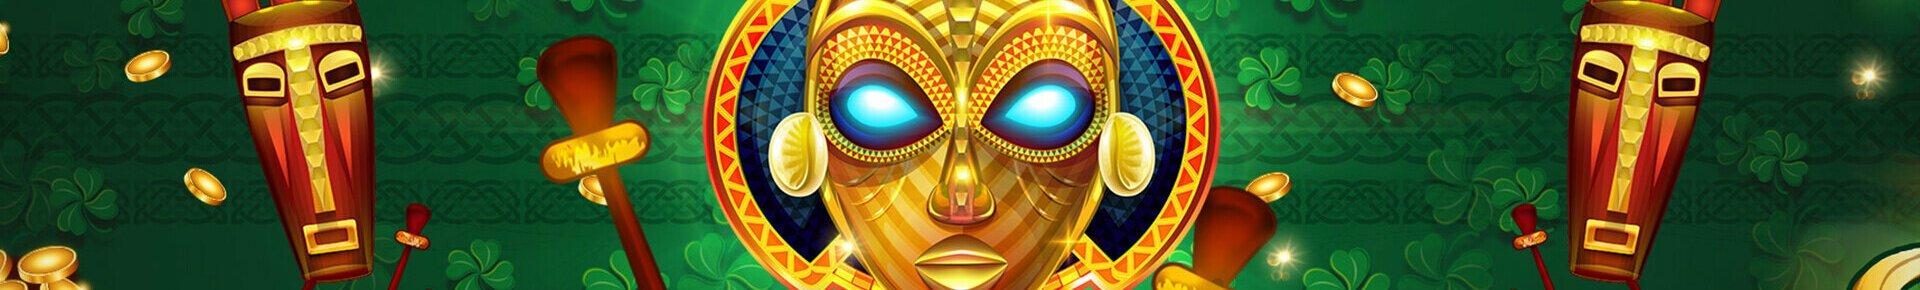 Lottomart Games casino review UK